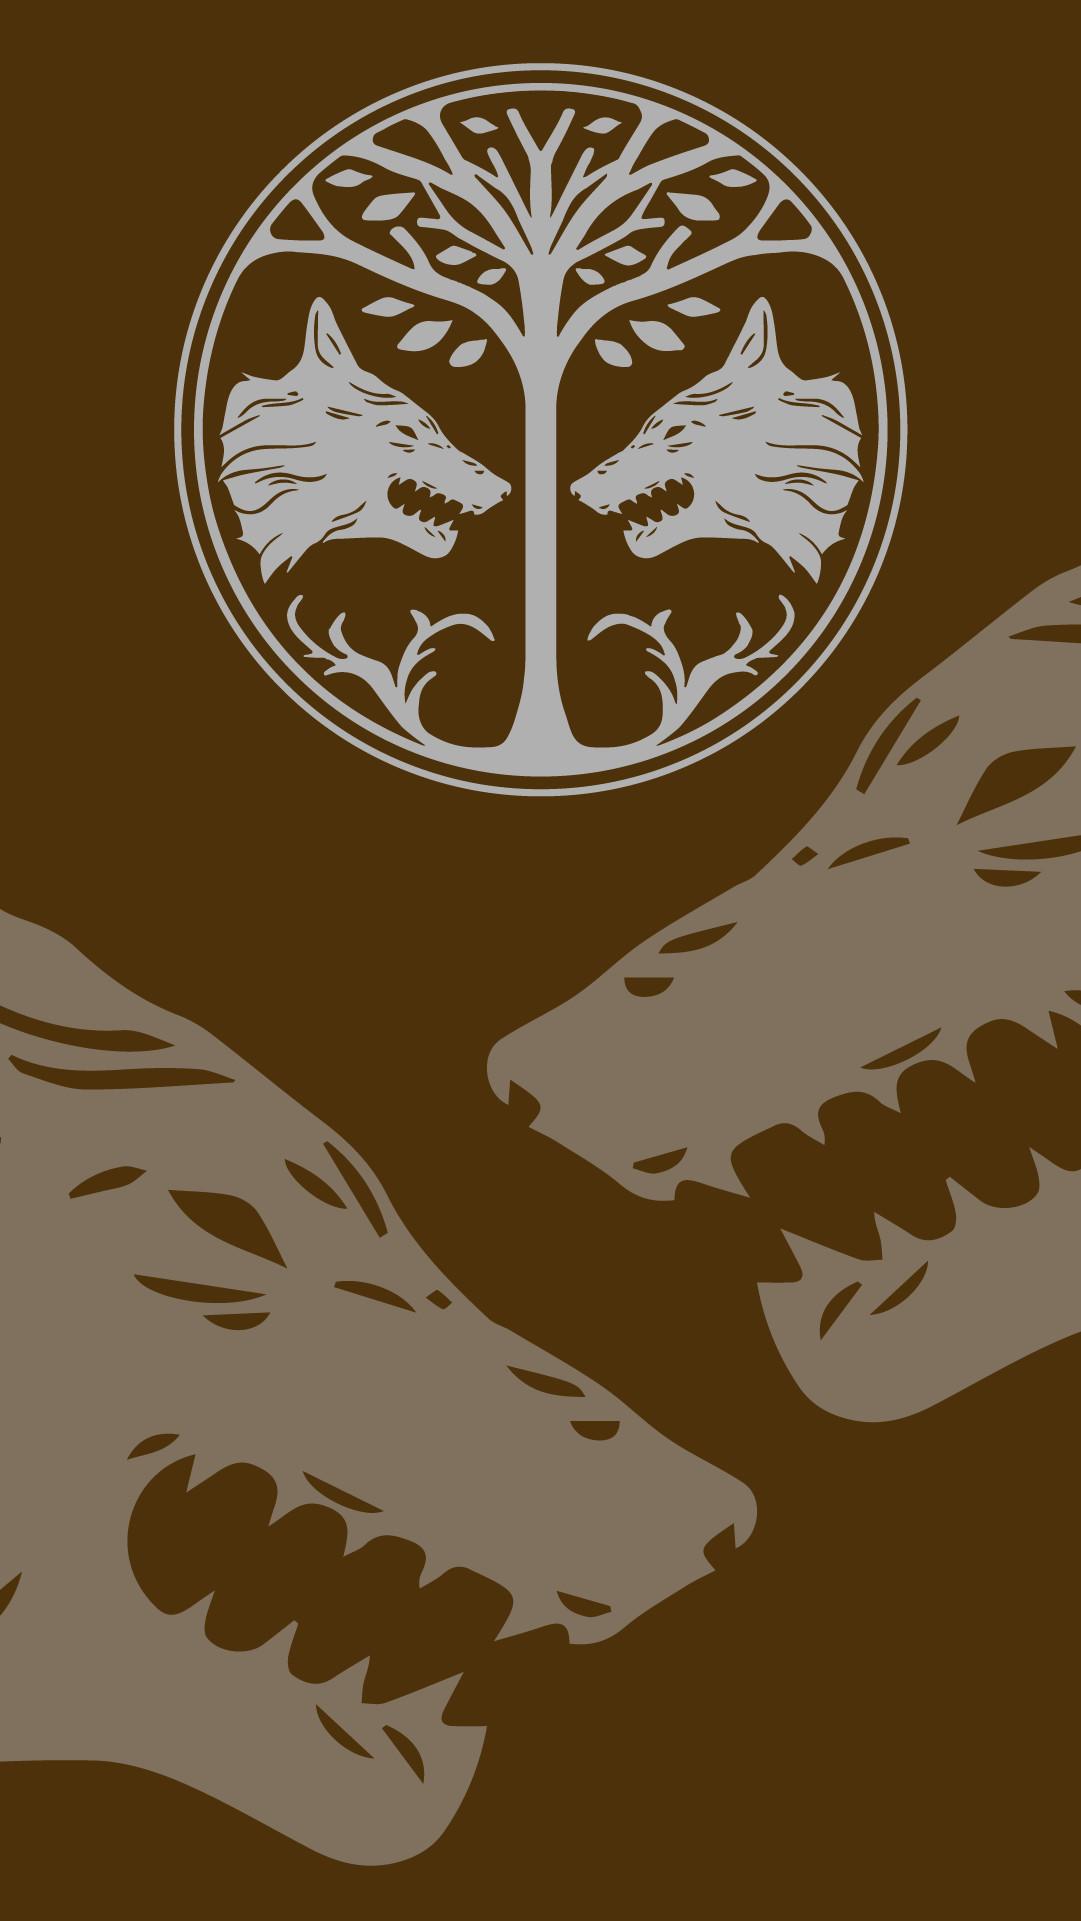 Destiny Emblems phone backgrounds